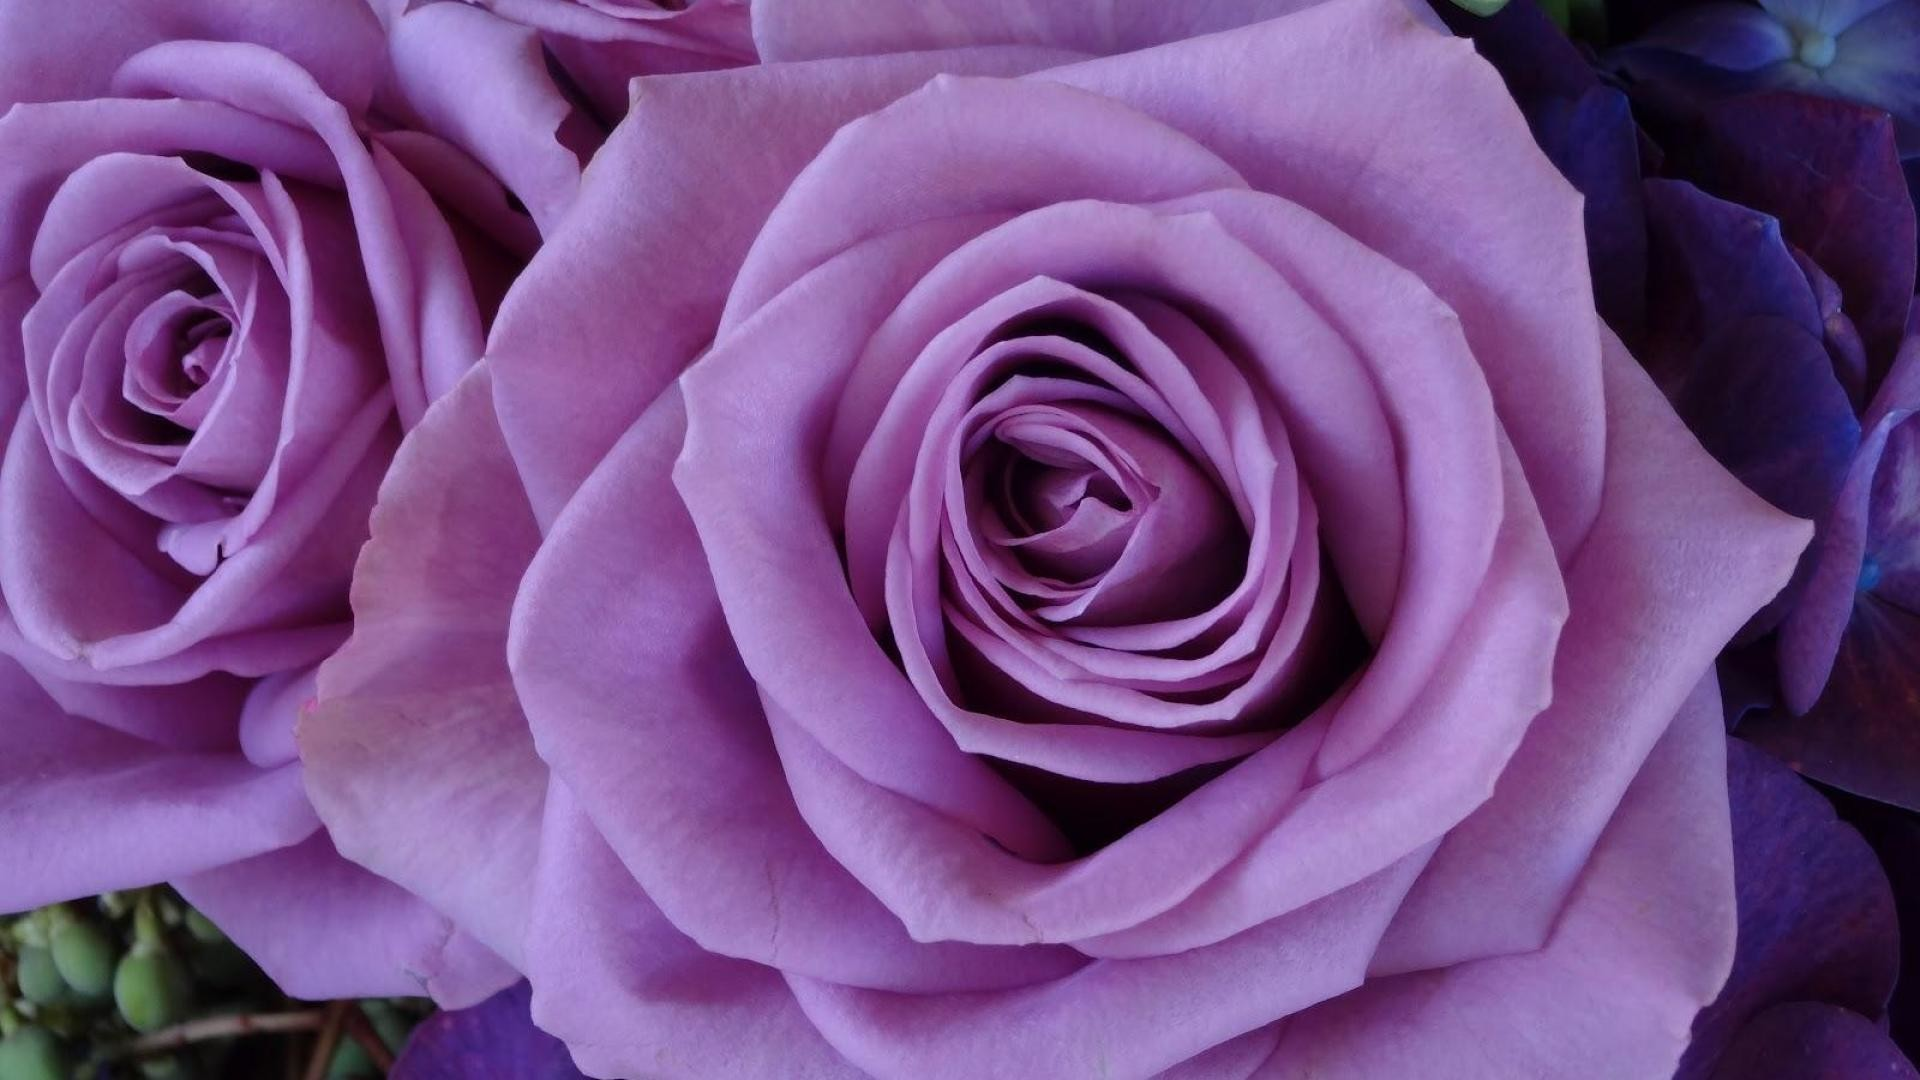 Purple roses wallpapers wallpapertag - Lavender purple wallpaper ...